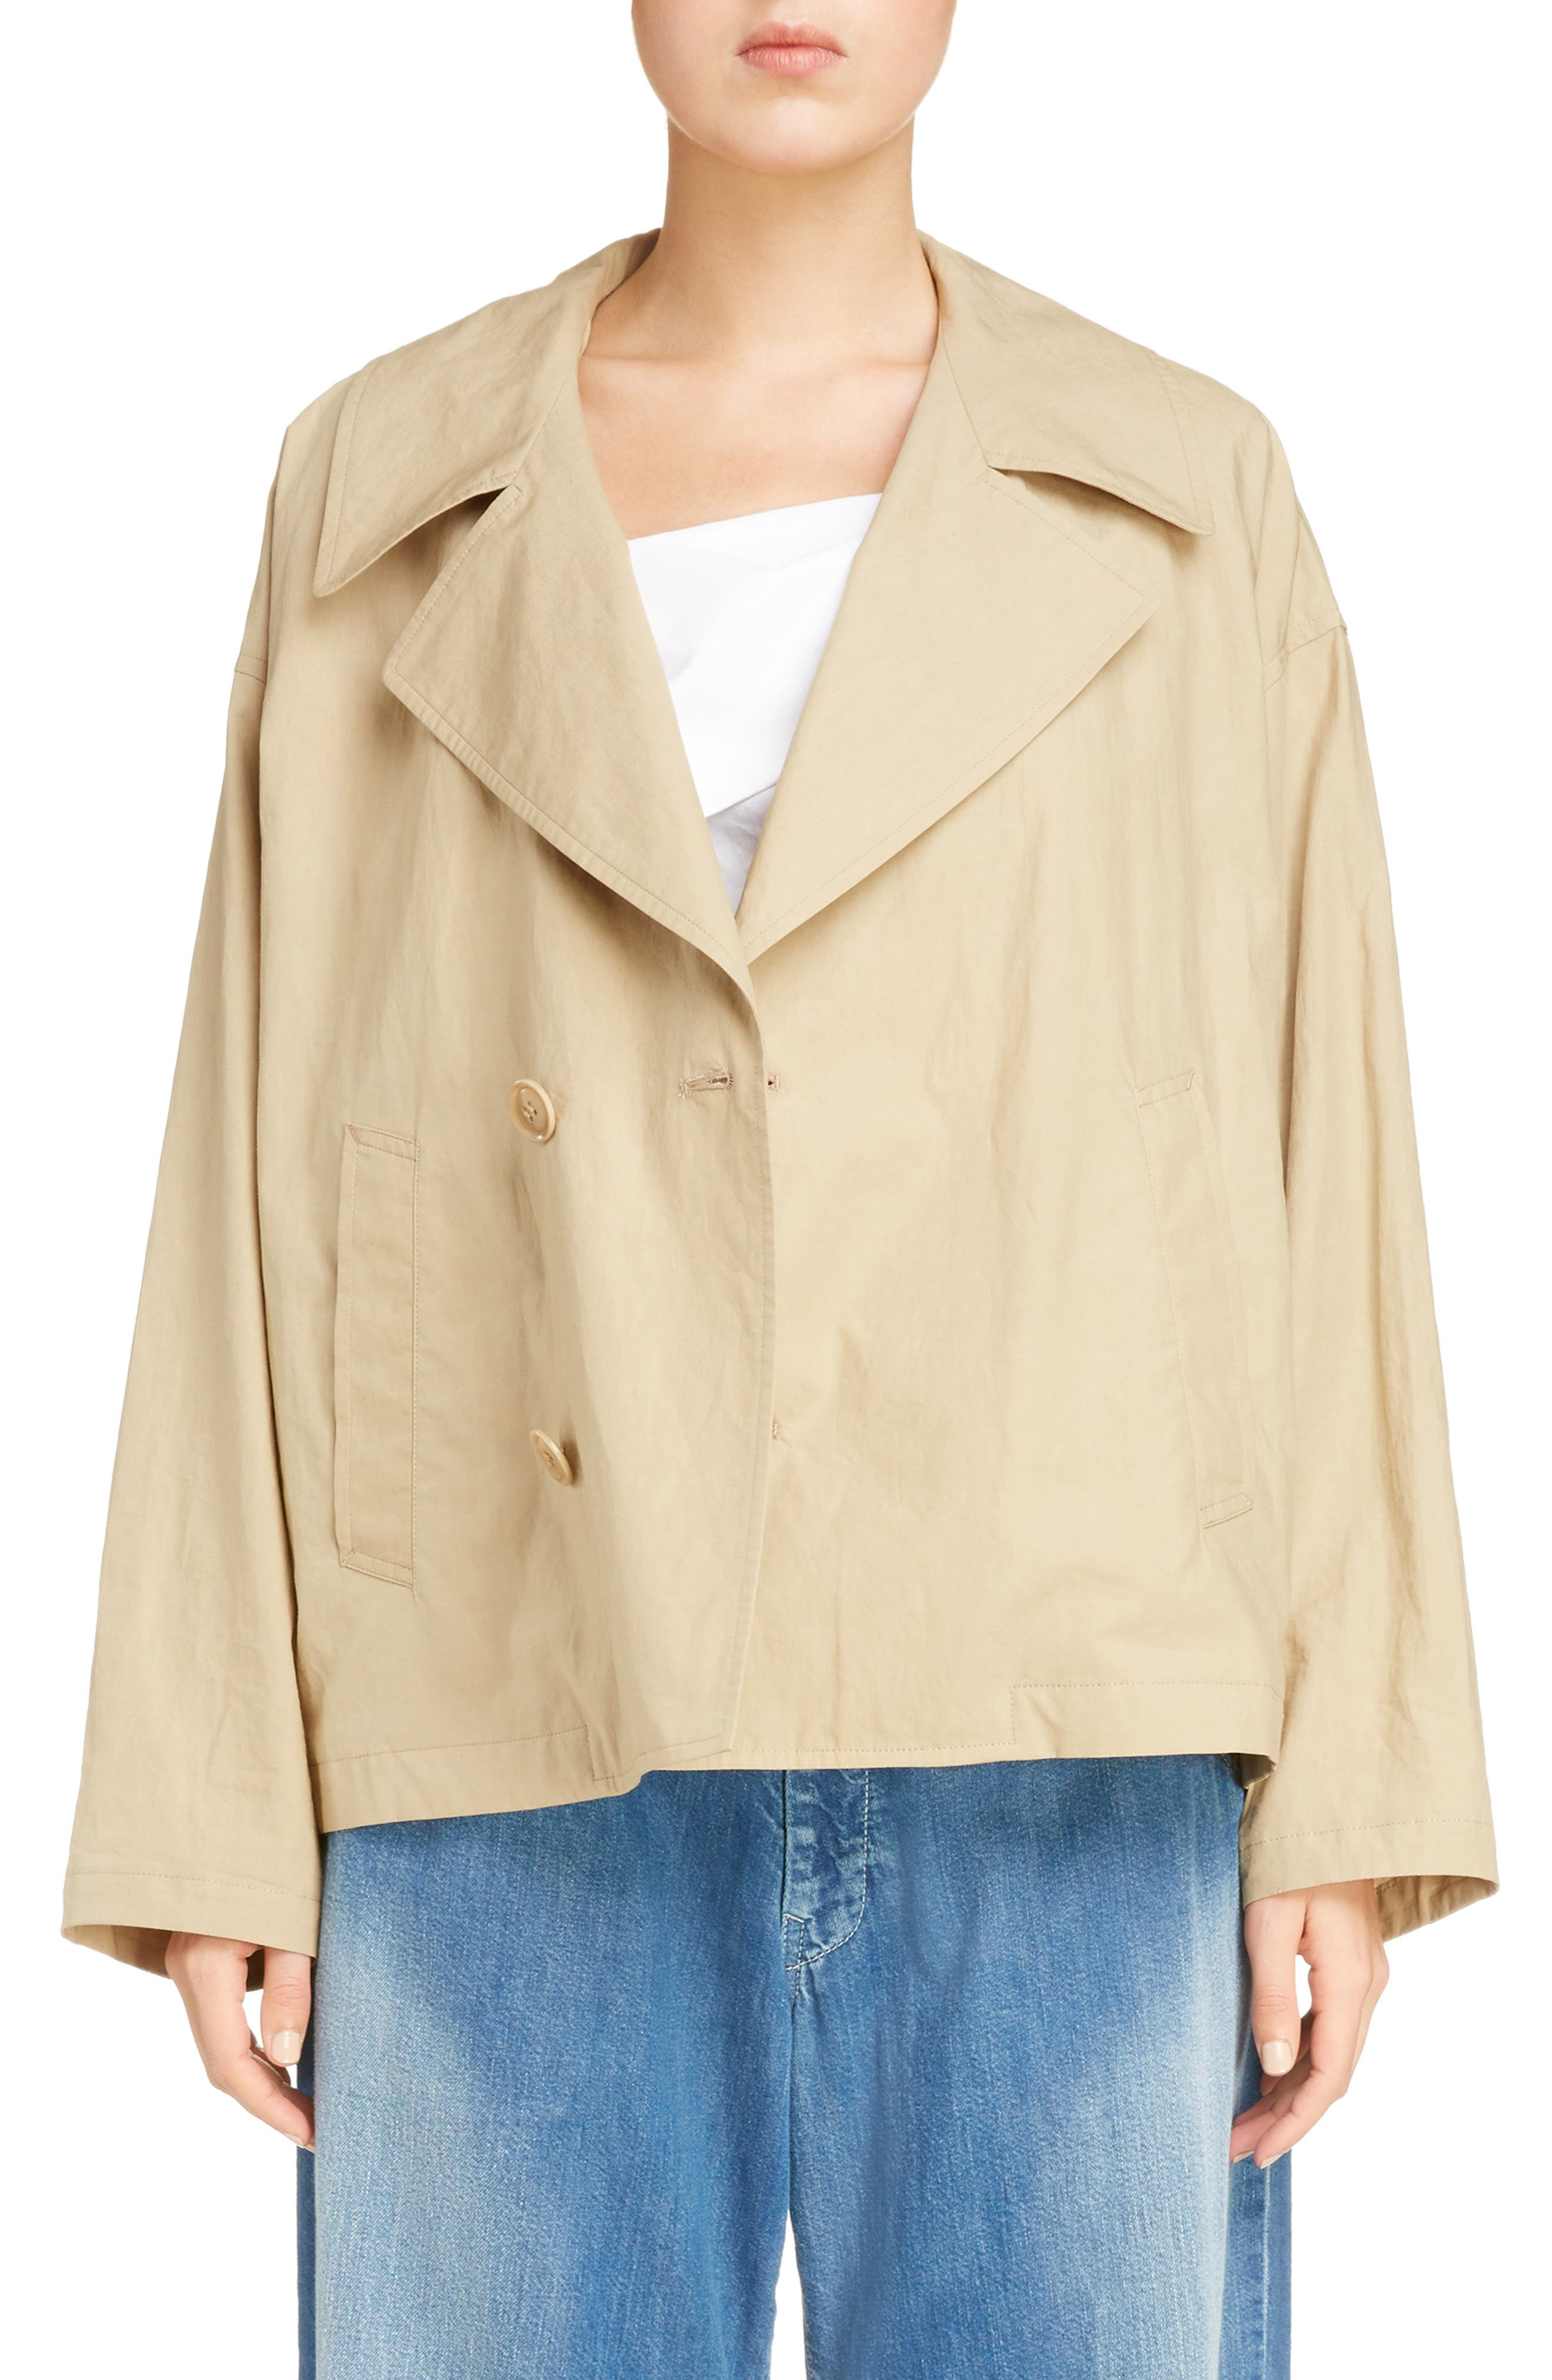 Y's by Yohji Yamamoto Large Lapel Cotton & Linen Blazer